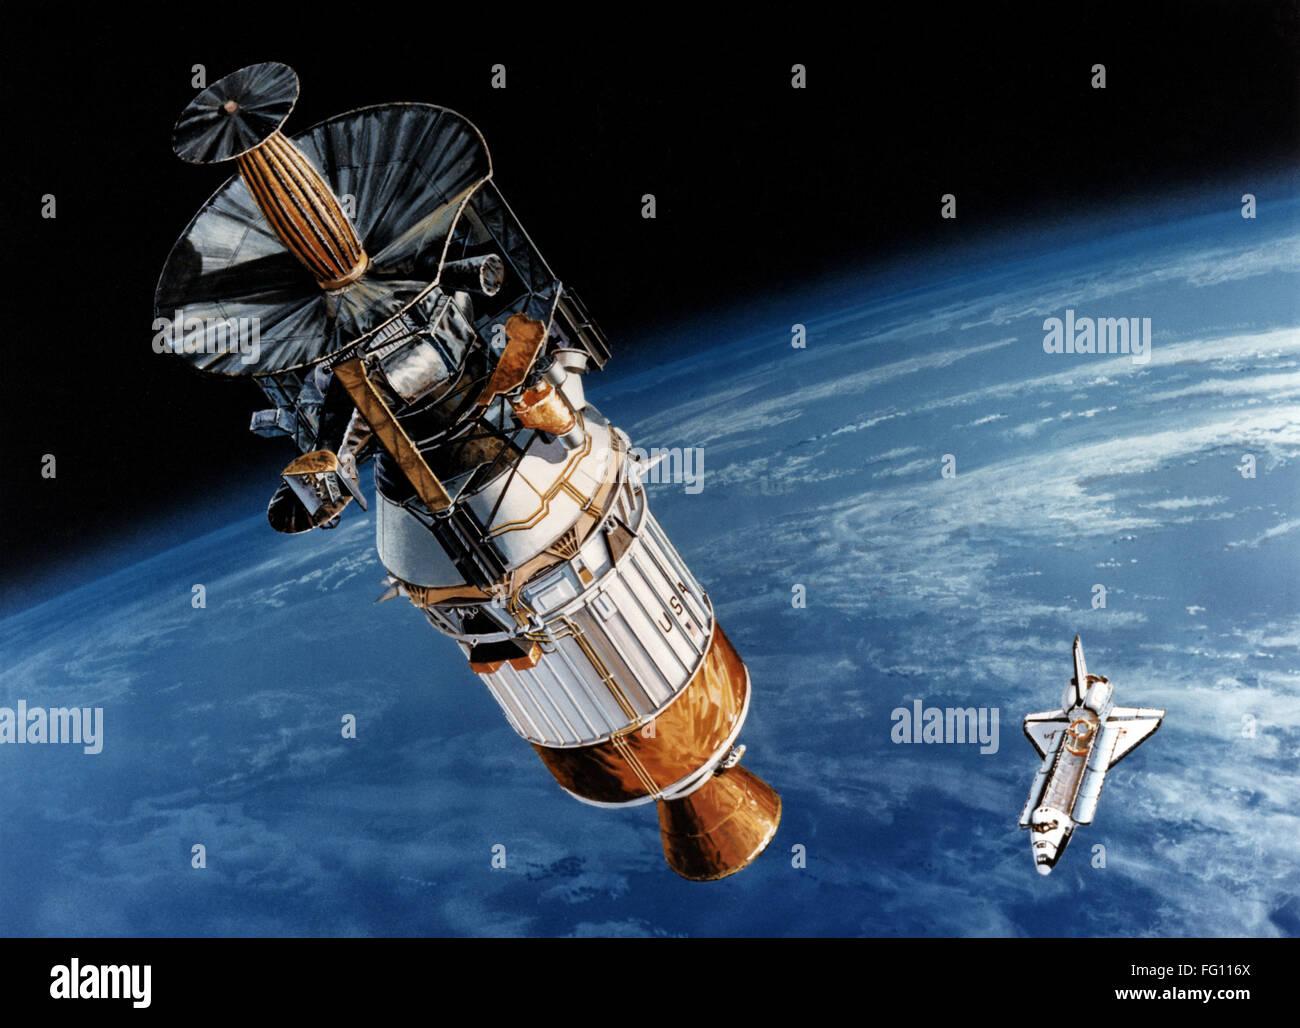 nasa galileo spacecraft - HD1024×819